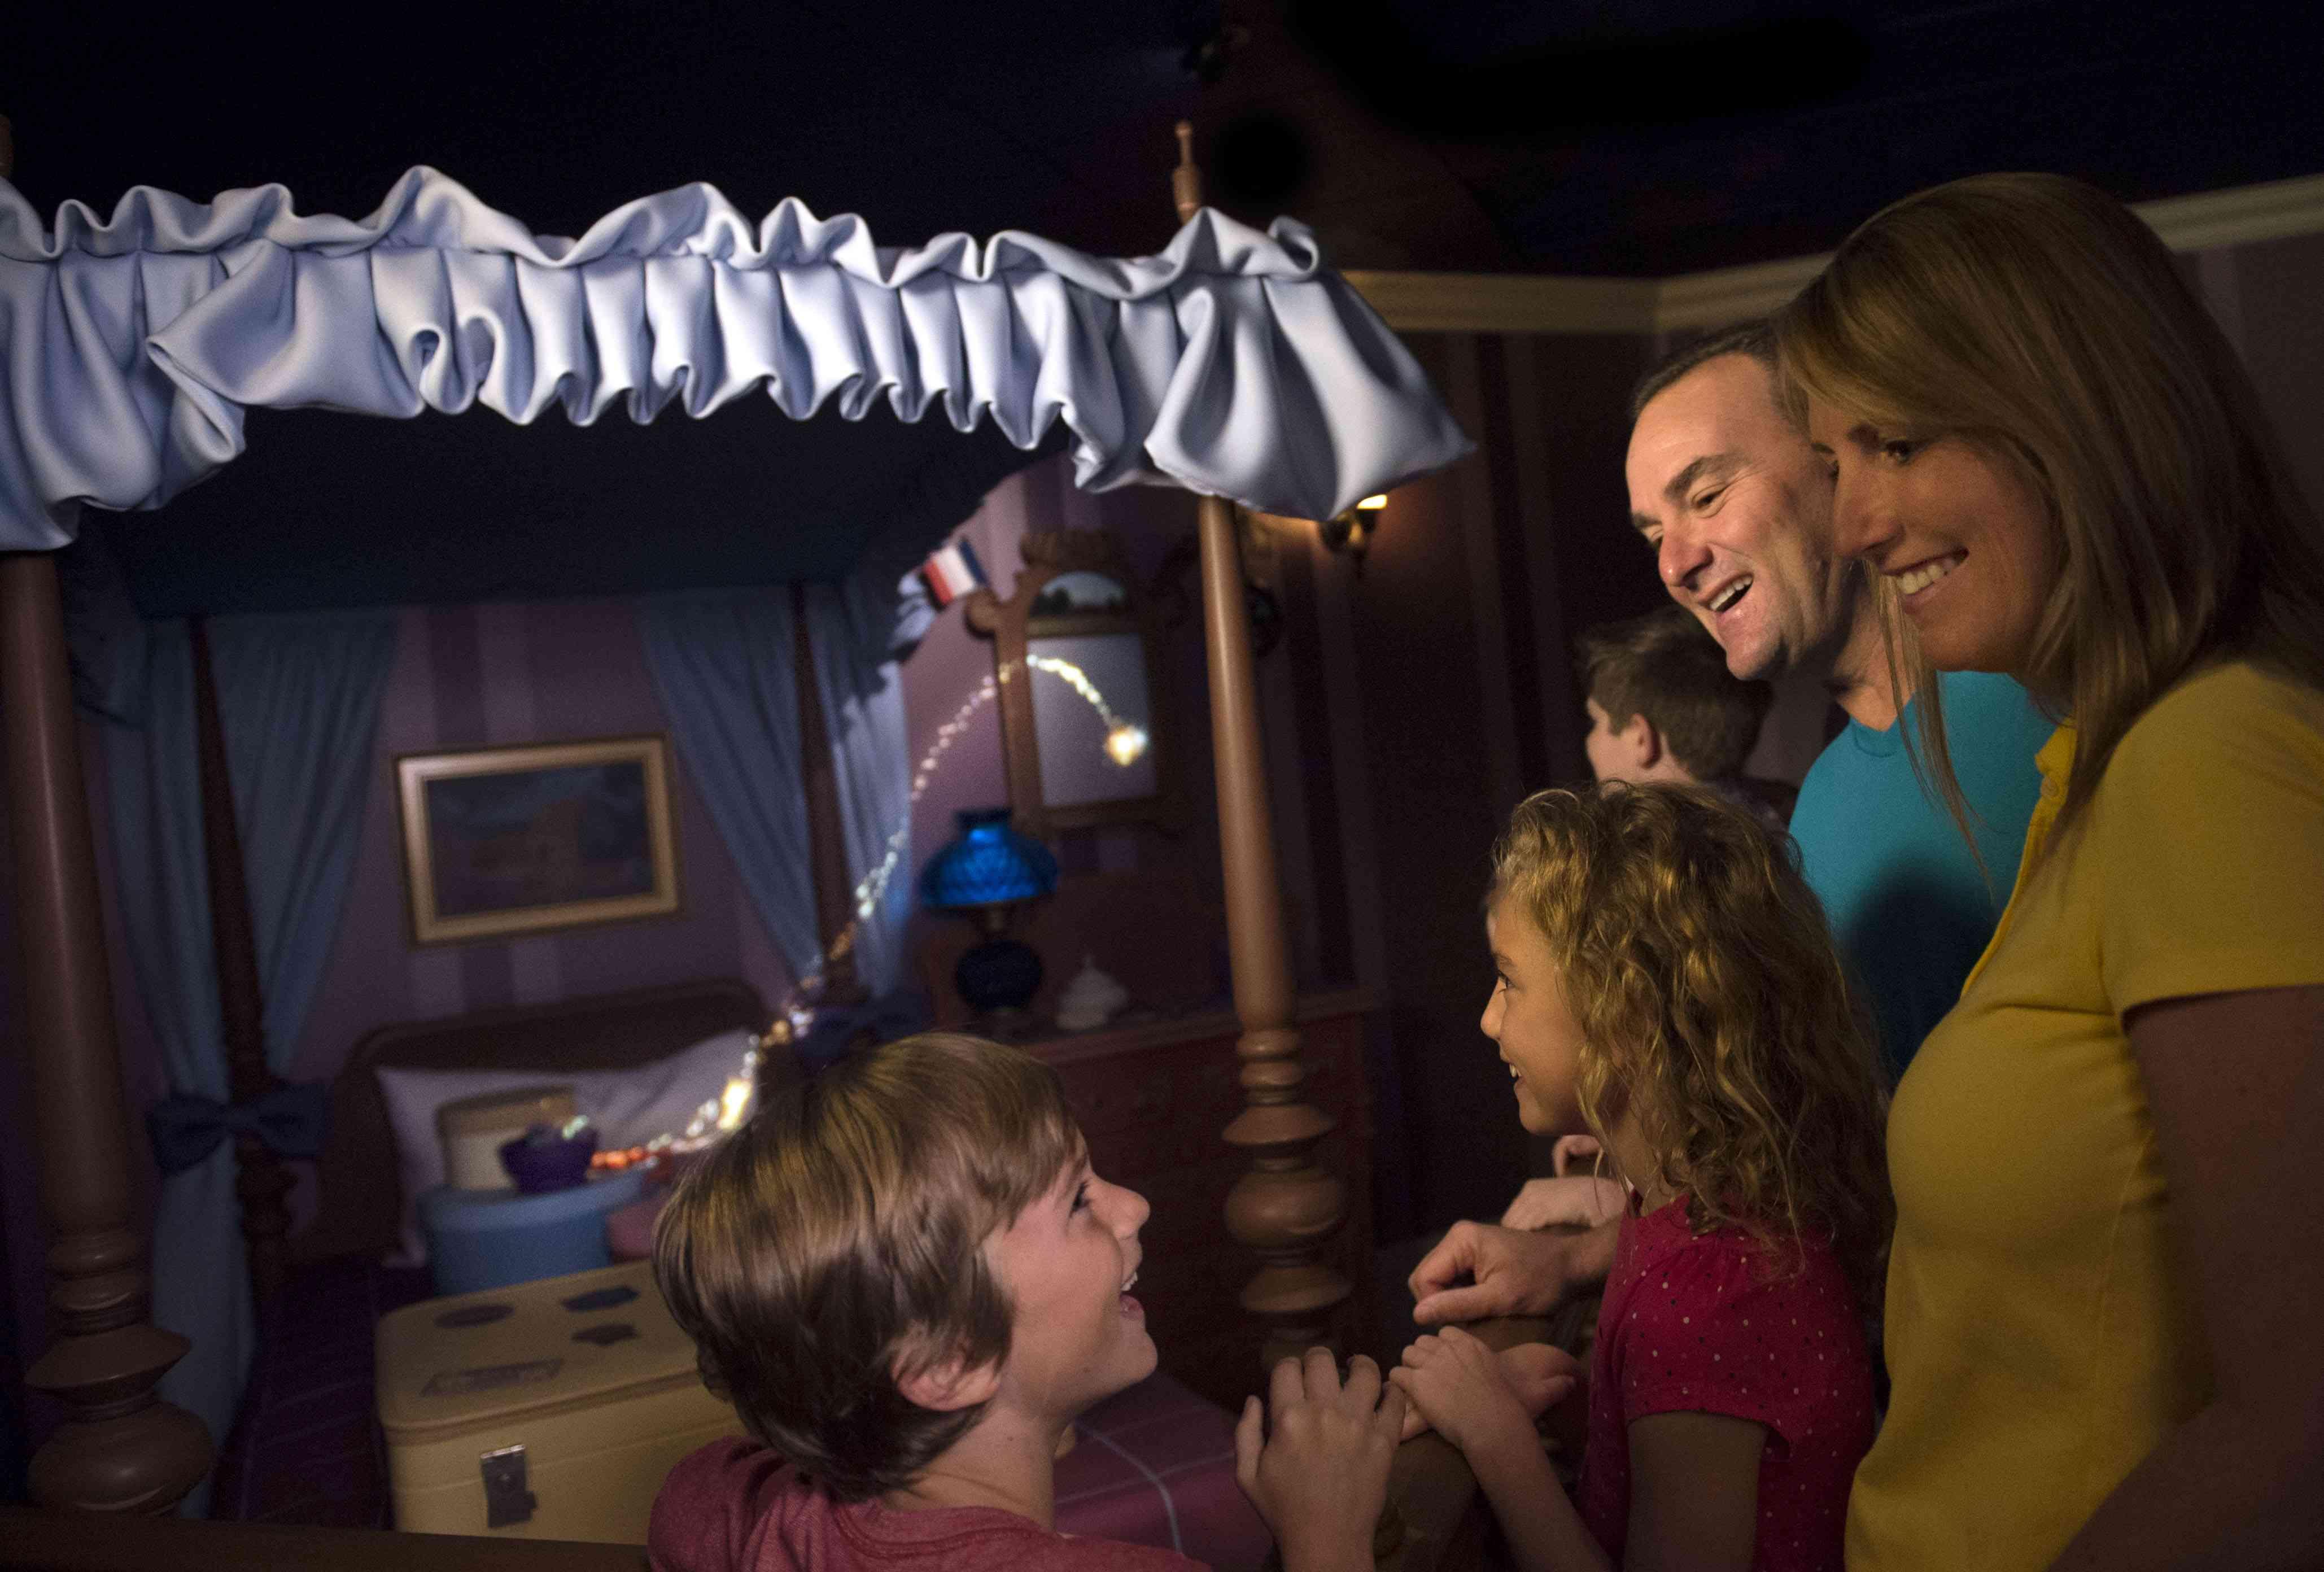 Peter Pan's Flight at Disney World